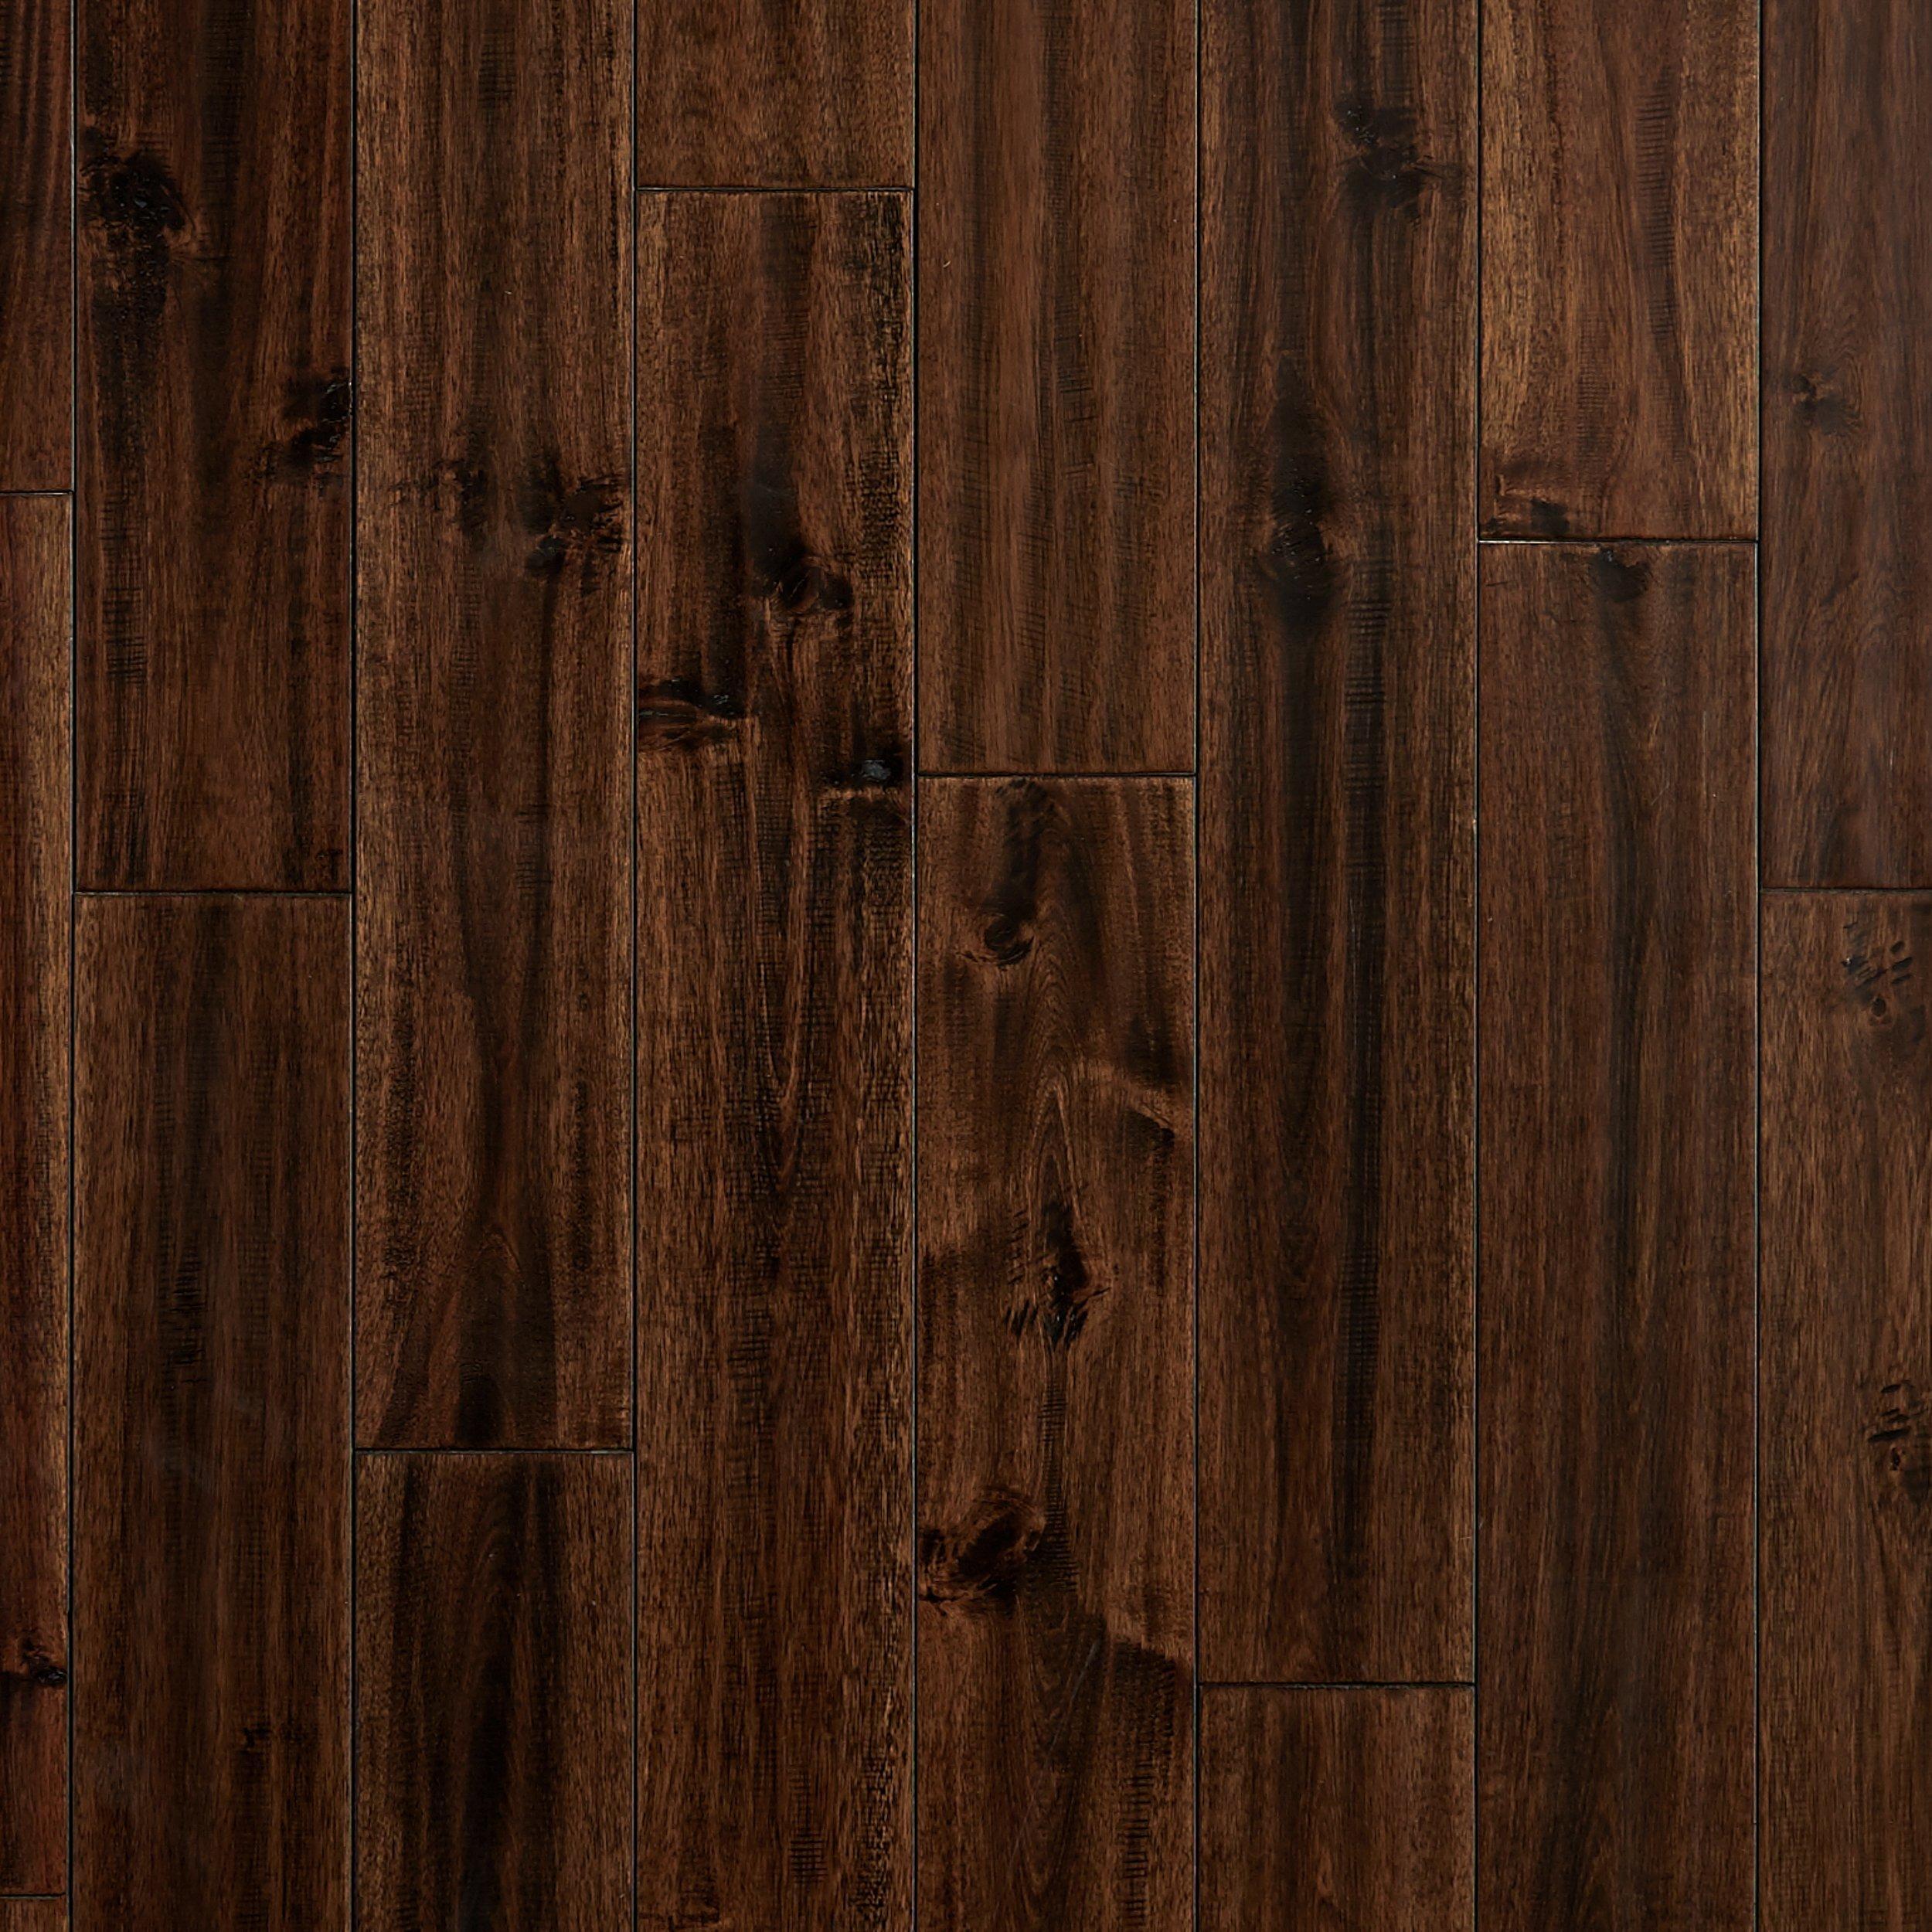 Acacia Ipe Hand Scraped Solid Hardwood   3/4in. X 4 3/4in.   942800465 |  Floor And Decor